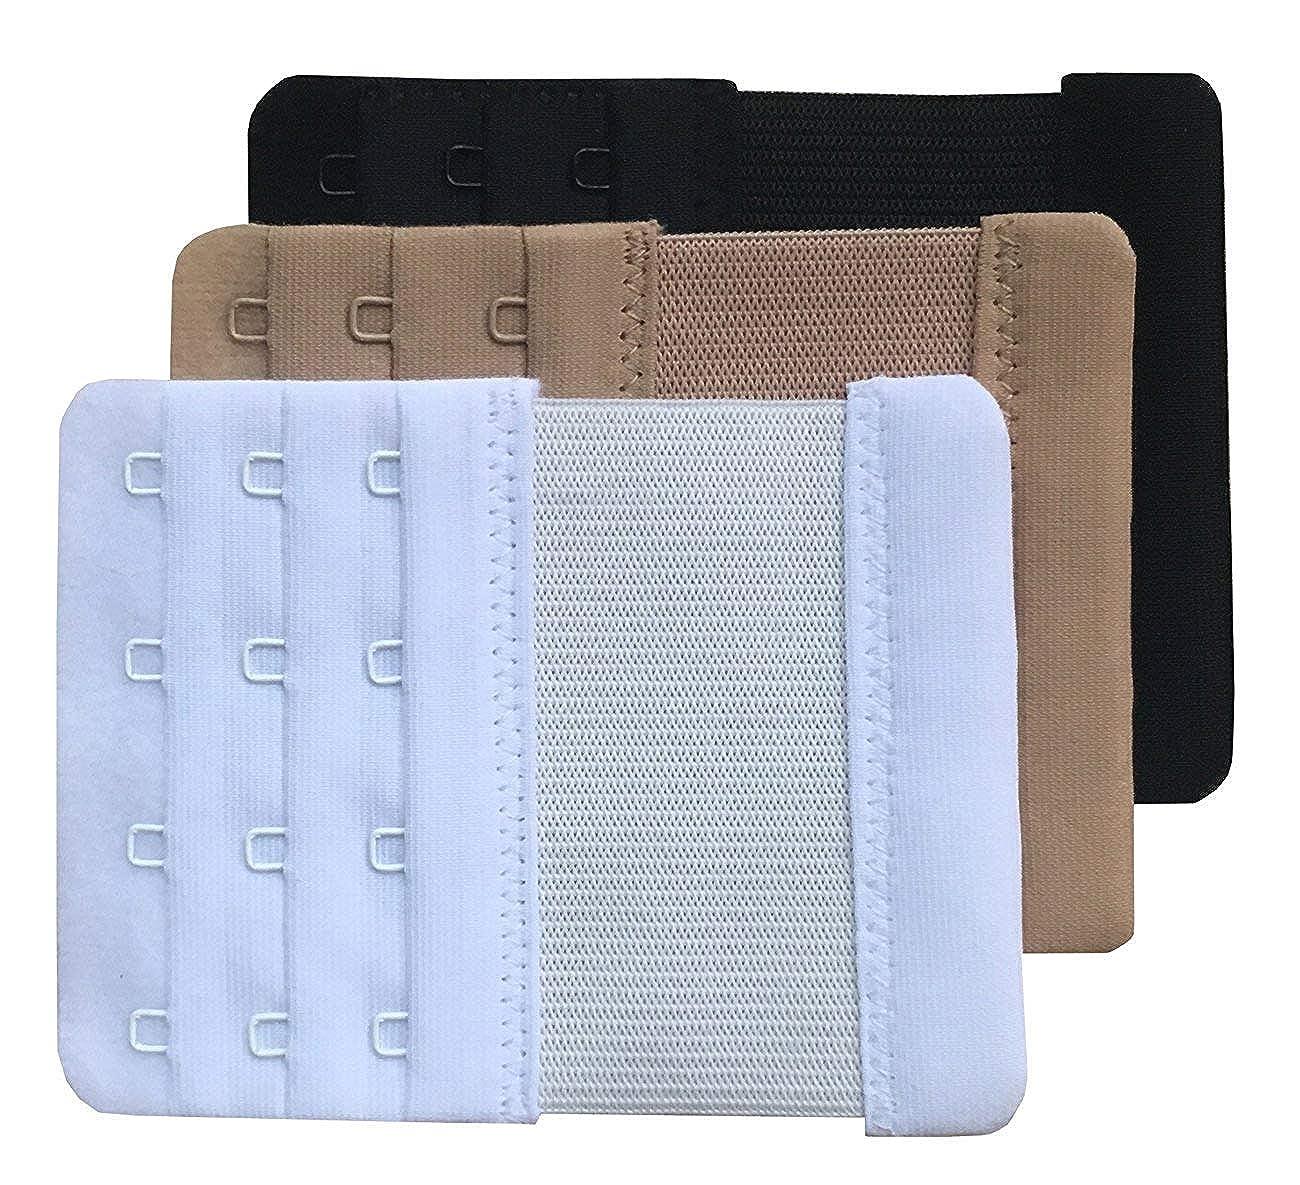 HomeWholesaleMarket Women Soft Comfortable 4 Hooks Bra Extender Pack of 3 - Multi Color